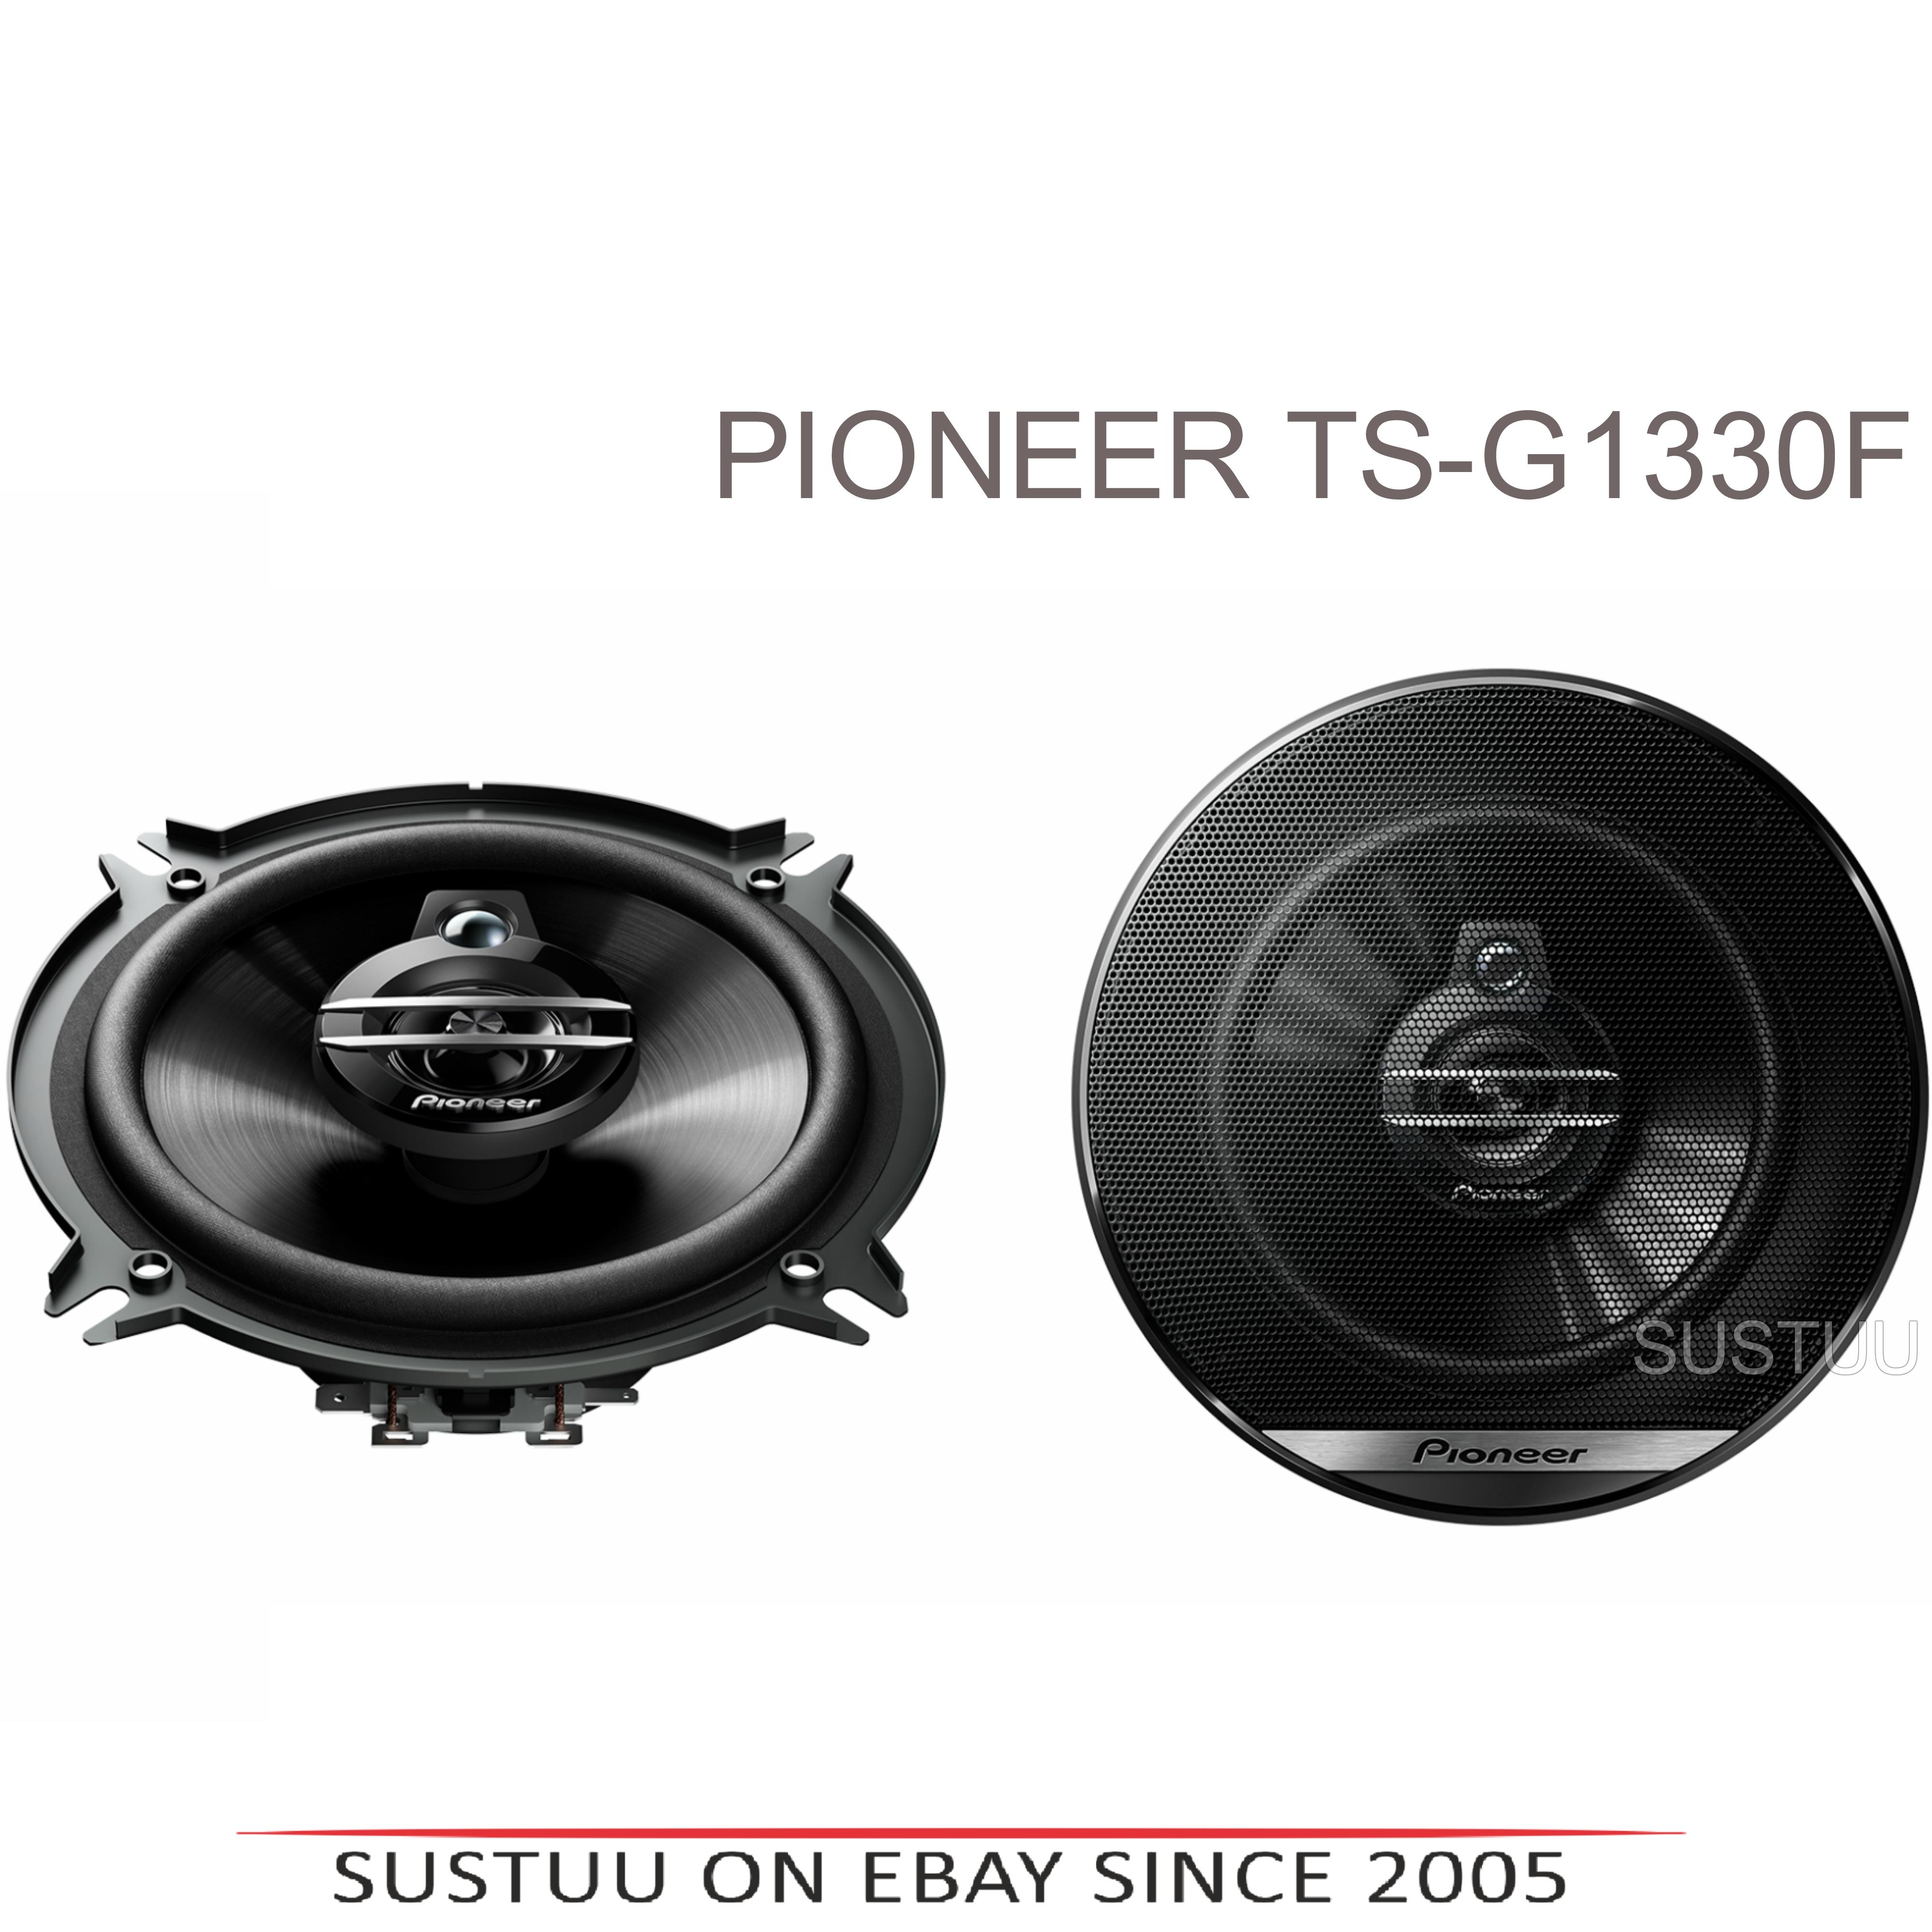 Pioneer TS G1330F|In Car 3-way Coaxial Speakers|G Series|Door-Shelf|13cm|35-250W